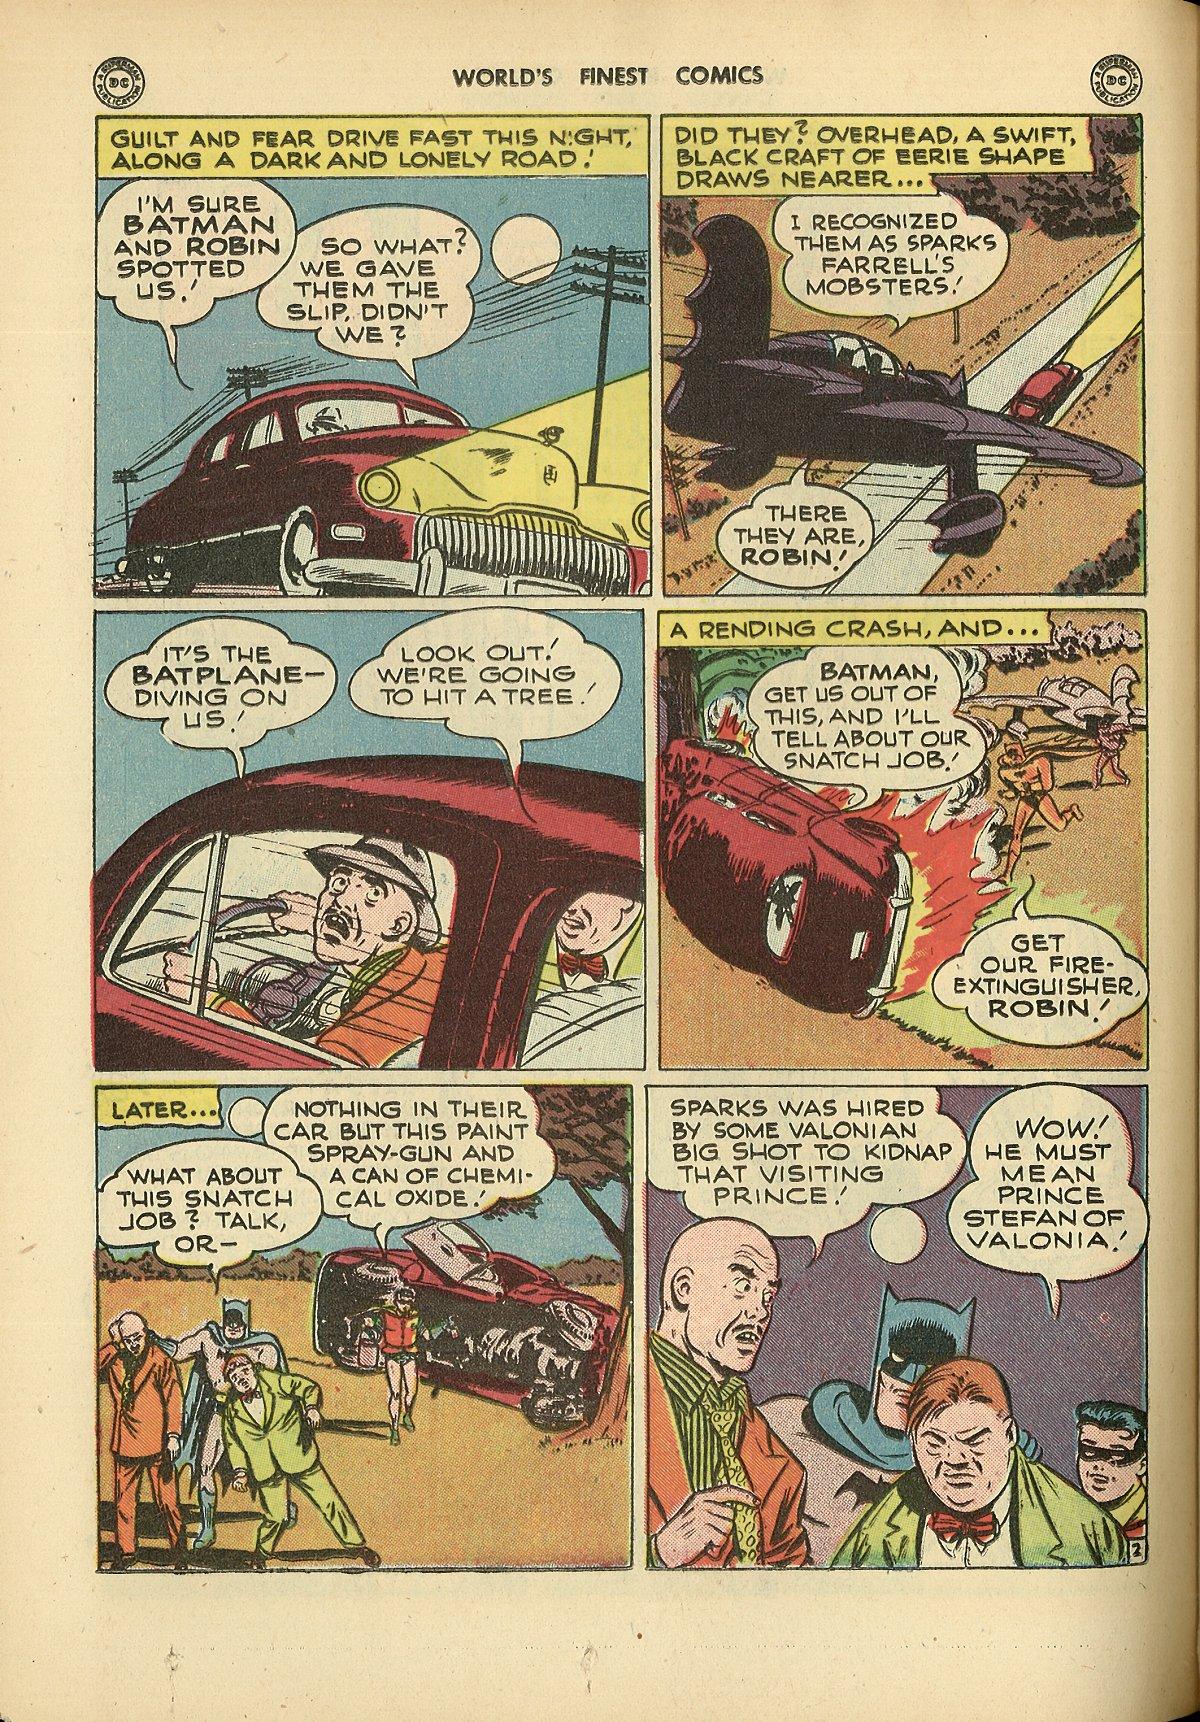 Read online World's Finest Comics comic -  Issue #26 - 62